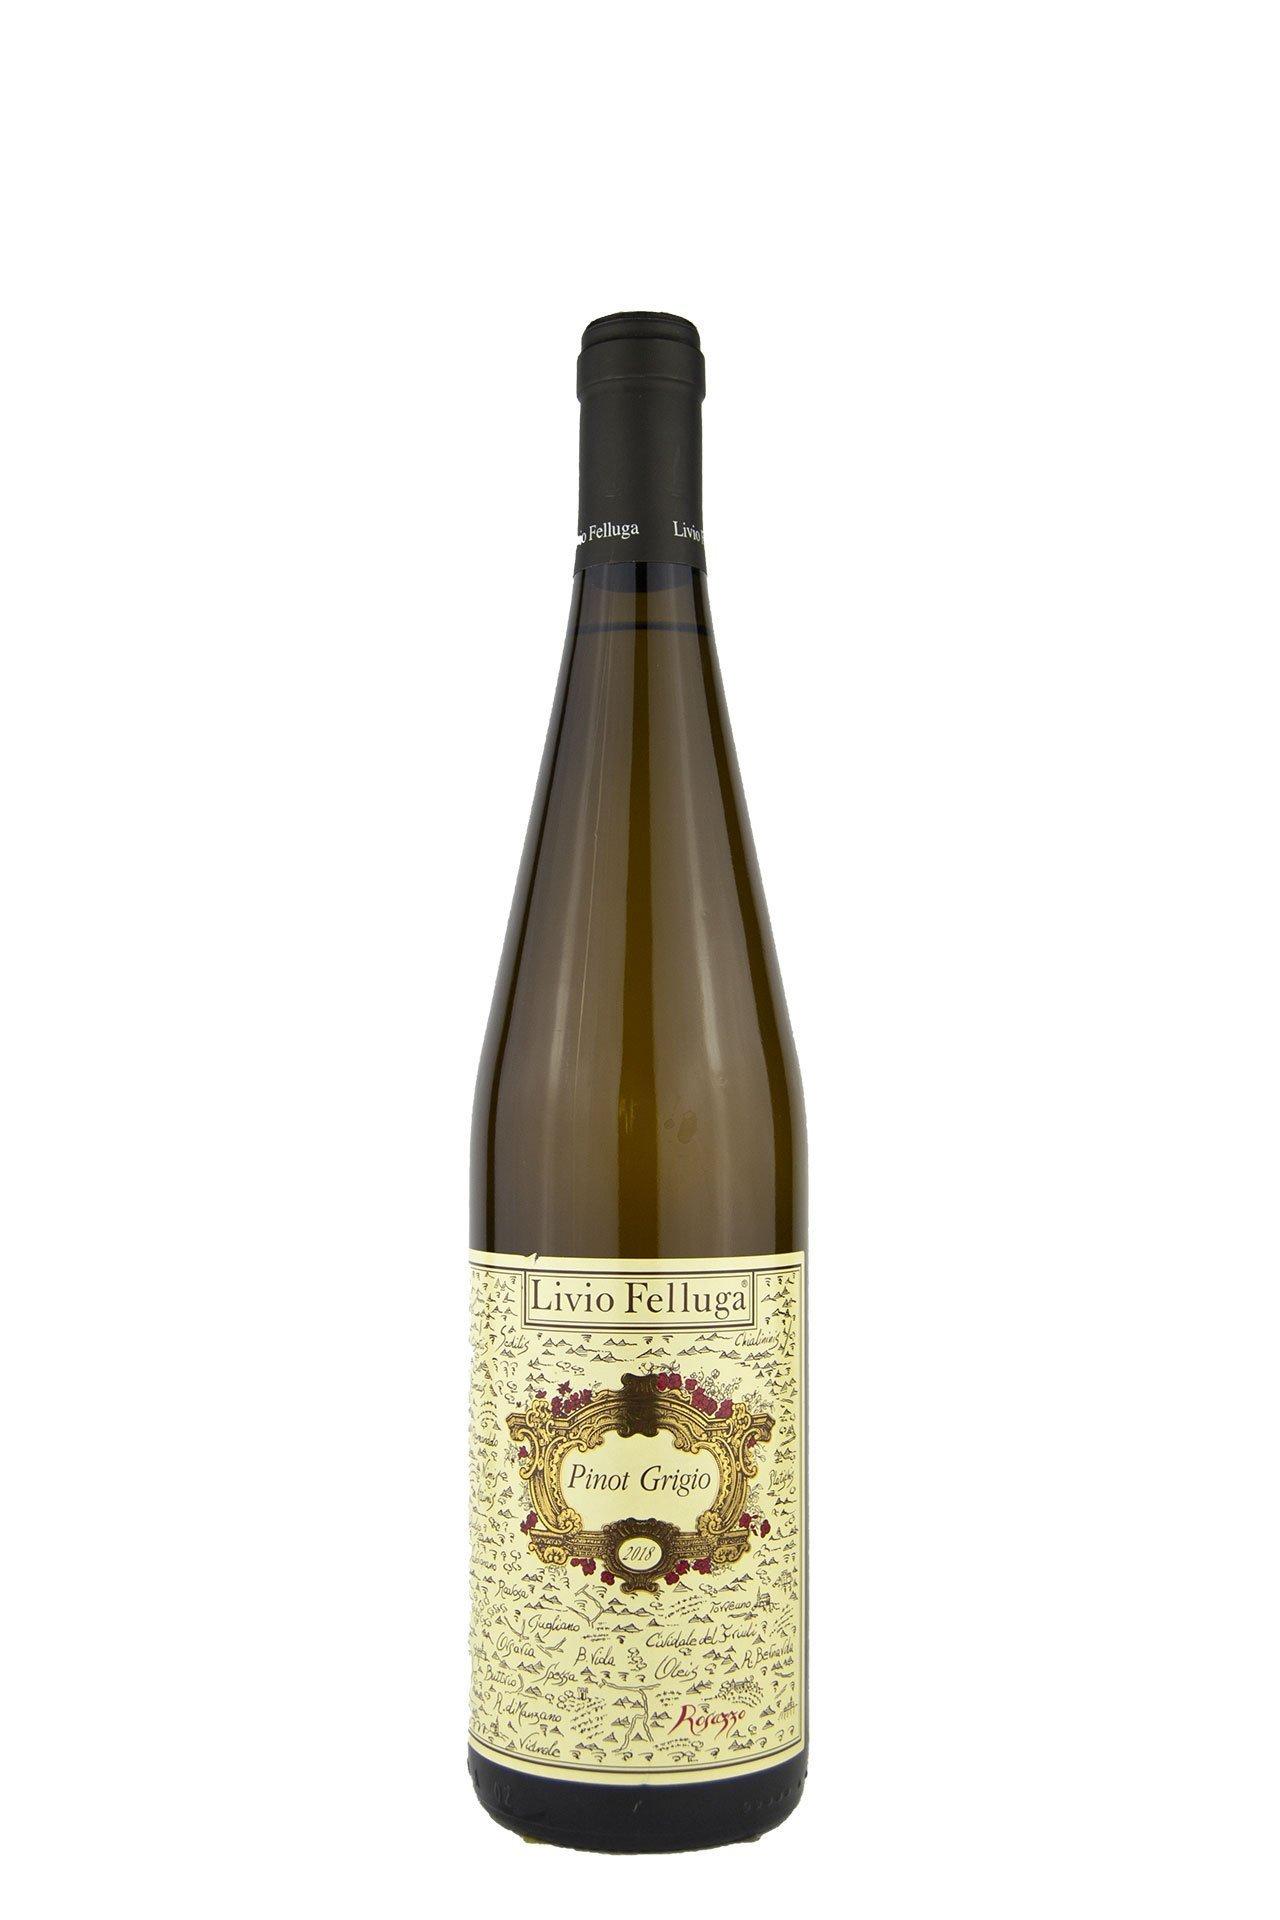 Livio Felluga – Pinot Grigio